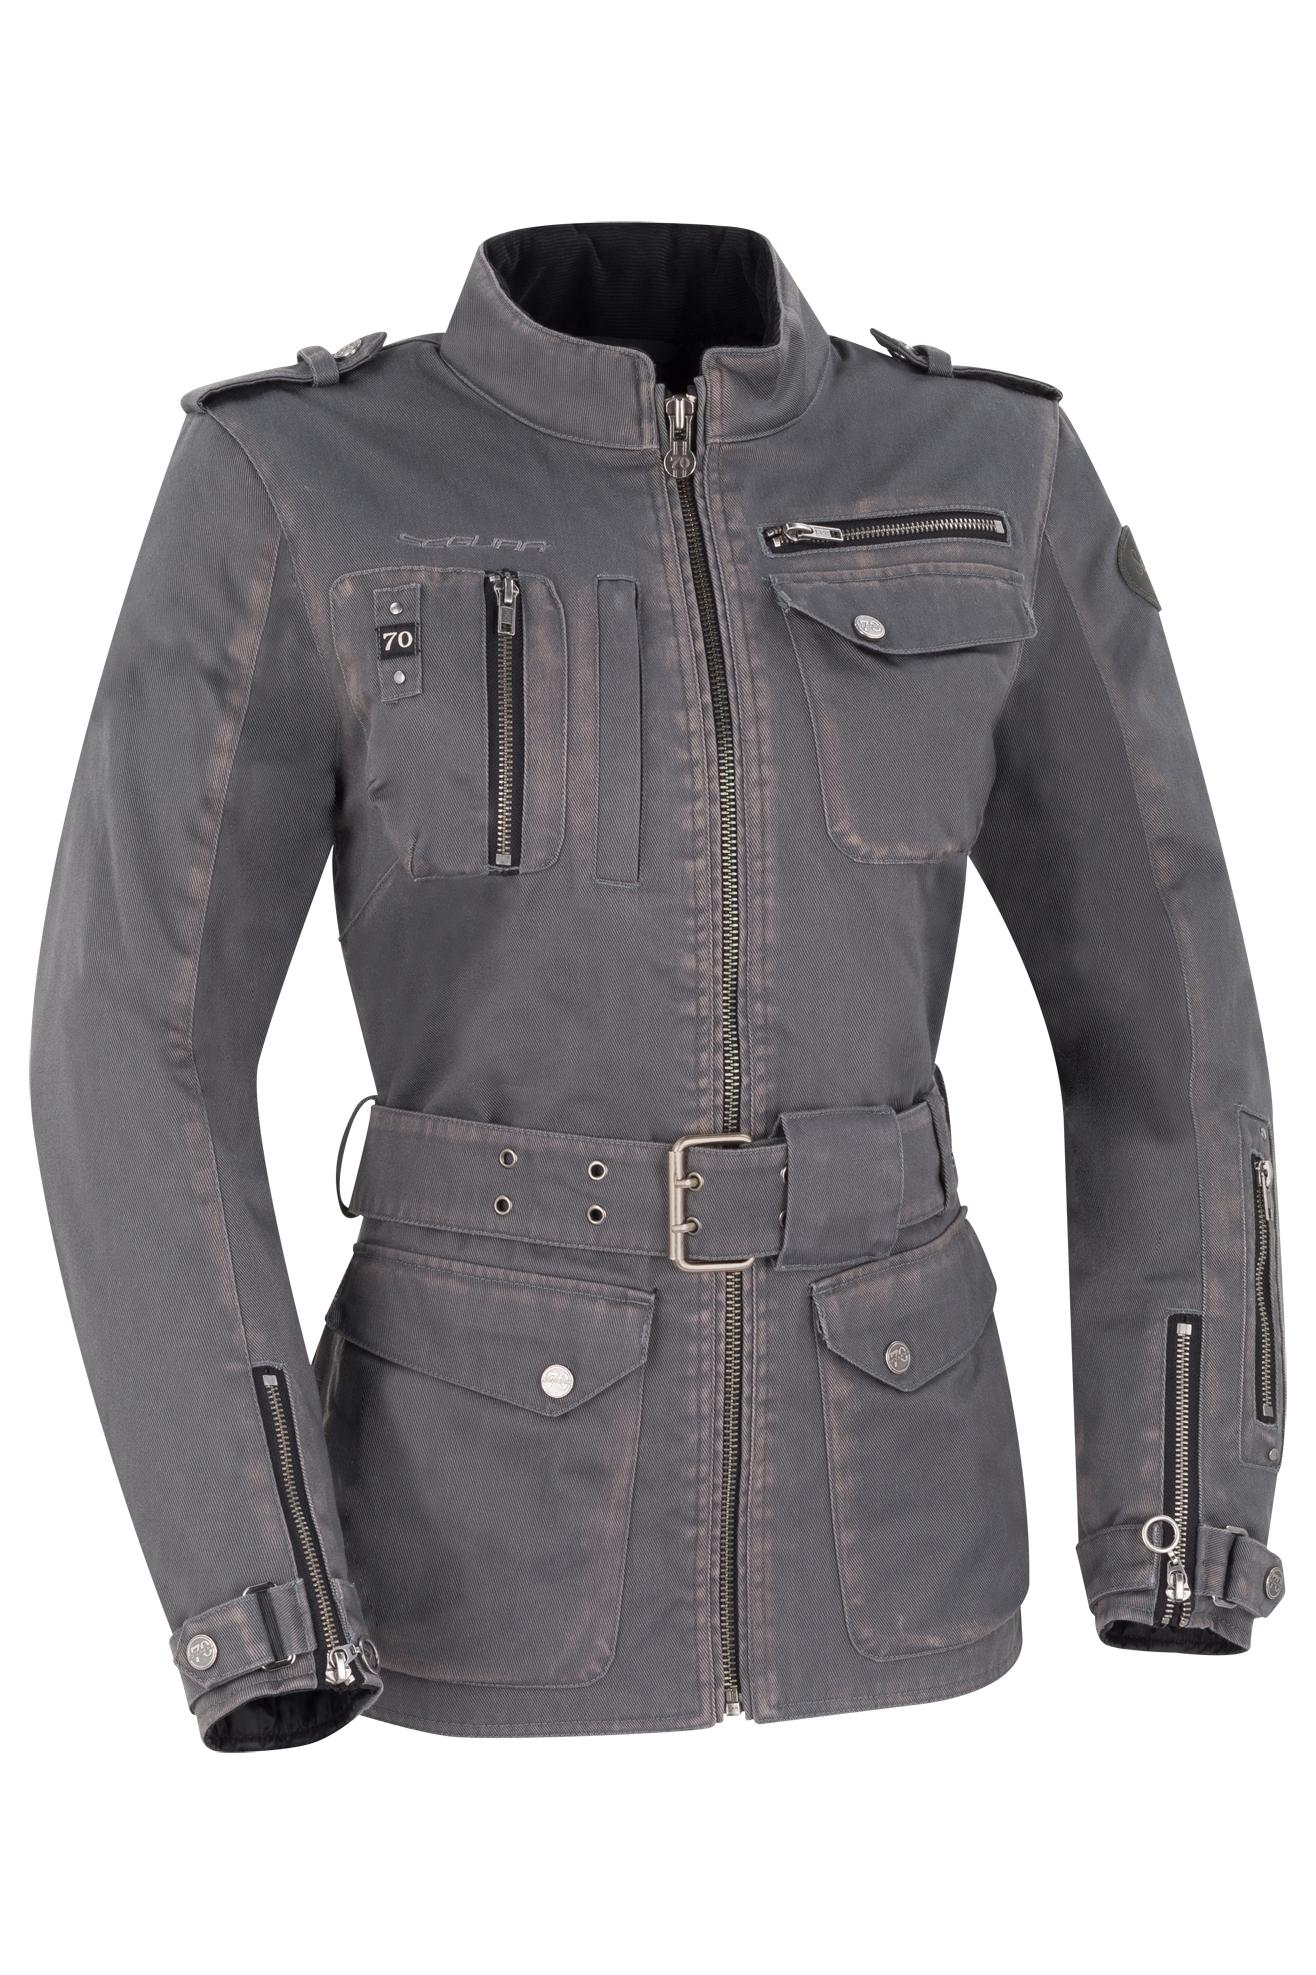 segura giacca moto donna  lady woodstock grigia